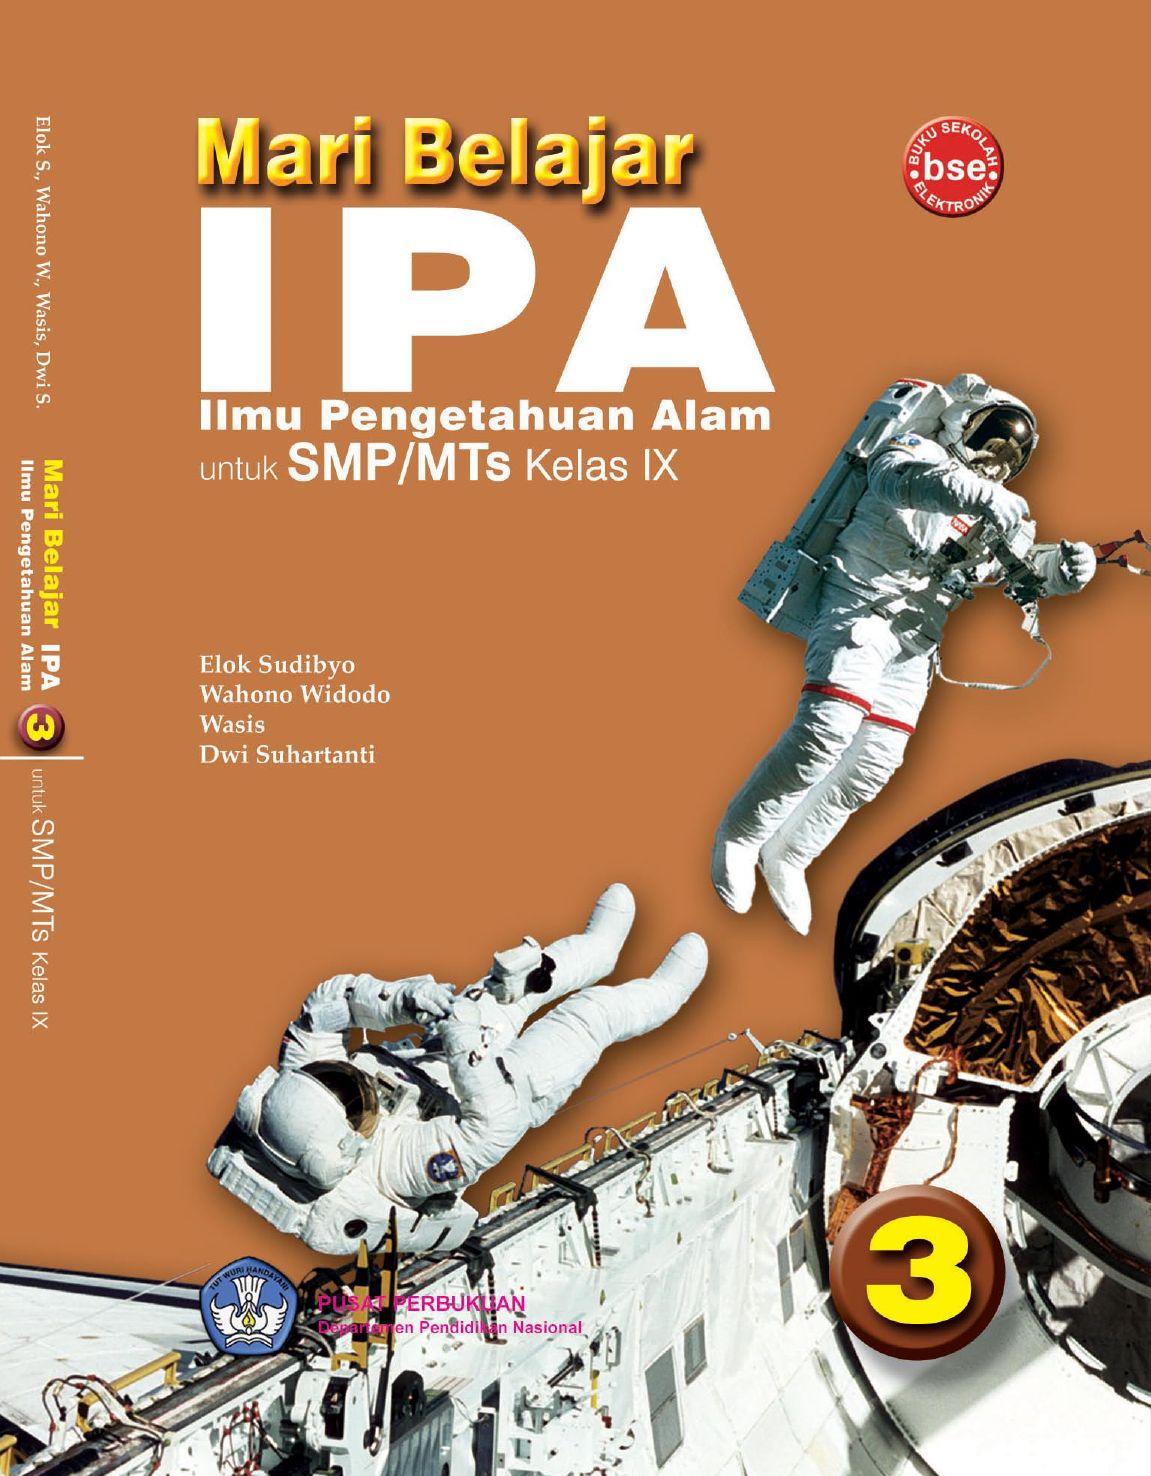 186 Gambar Clip Art Sketsa Tumpukan Buku 30 Cm Jpg